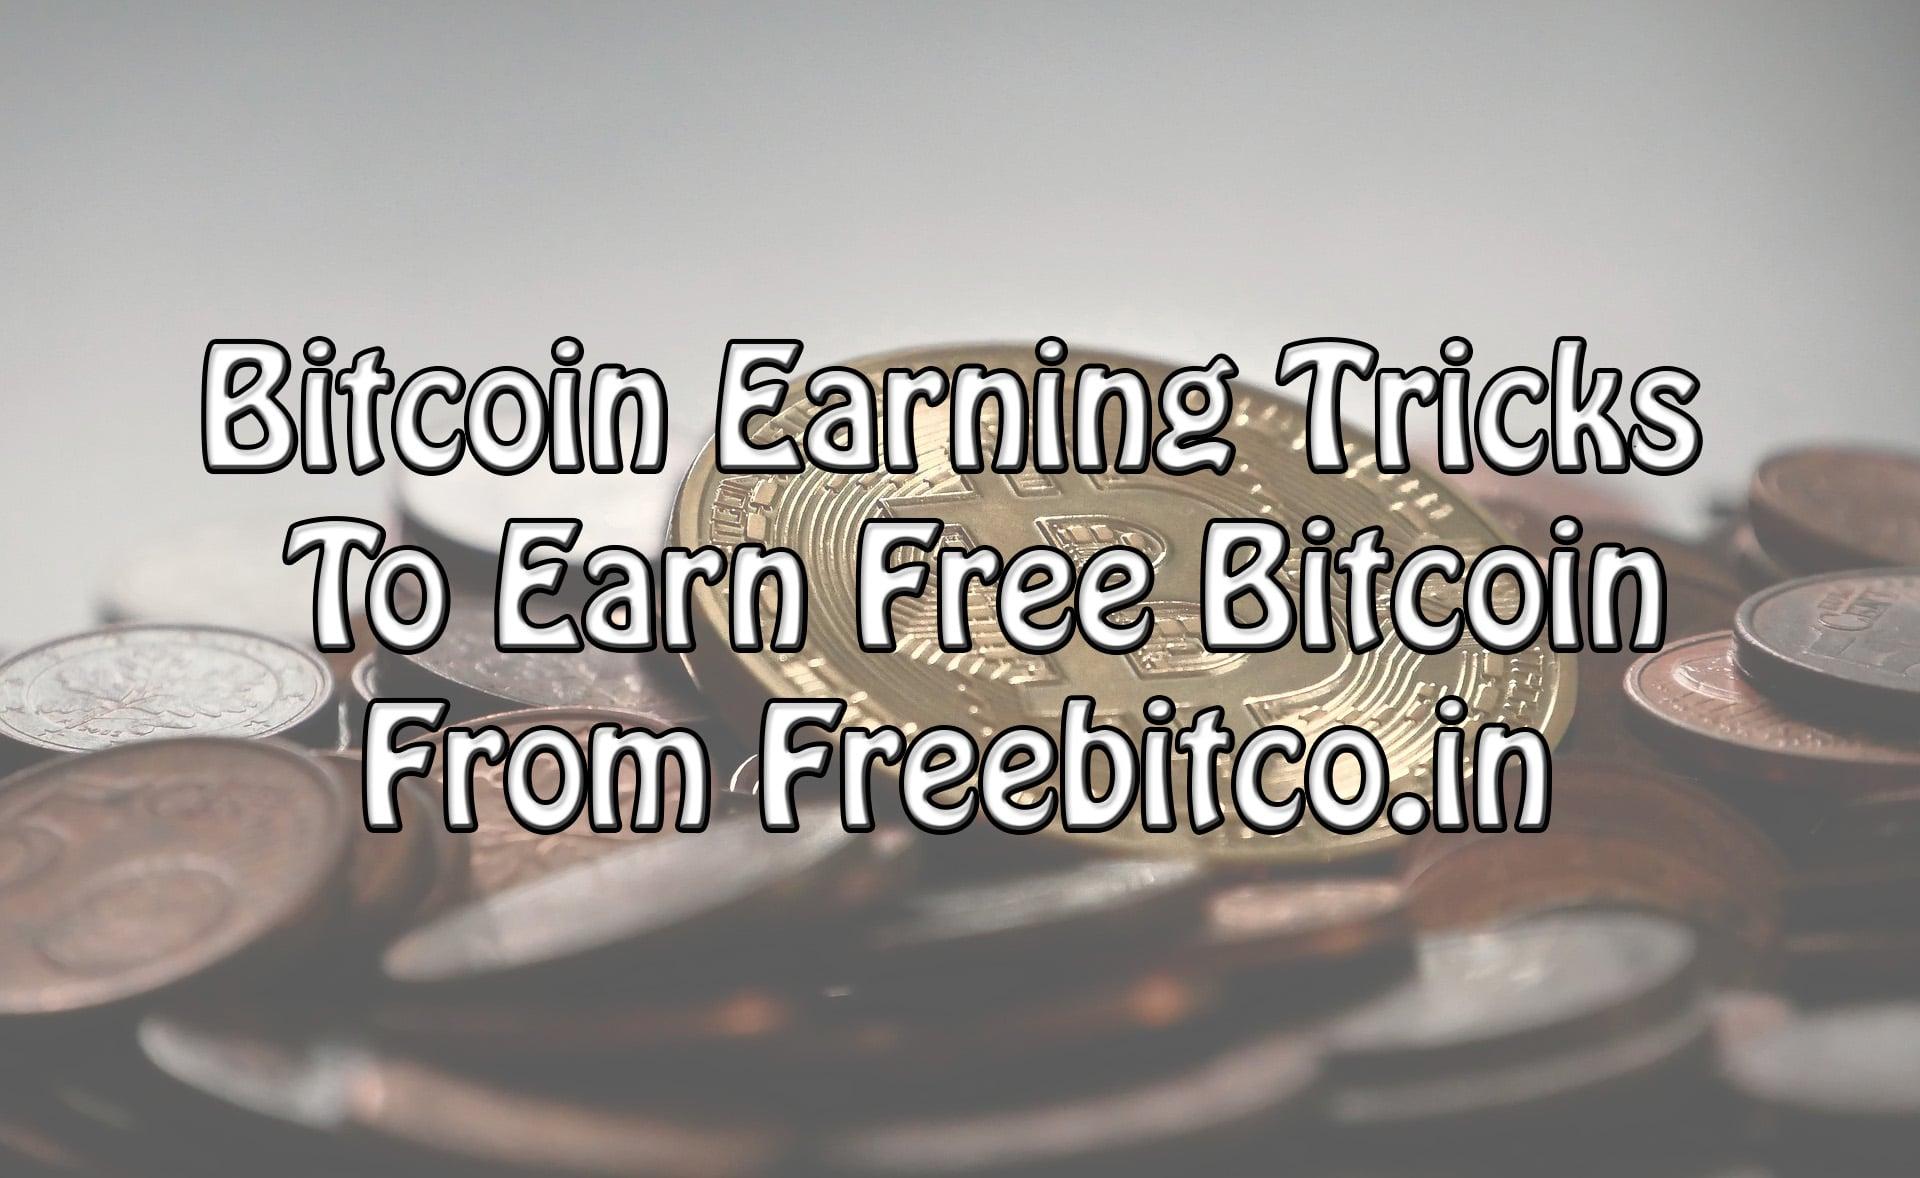 6 Bitcoin Earning Tricks To Earn Free Bitcoin From Freebitco